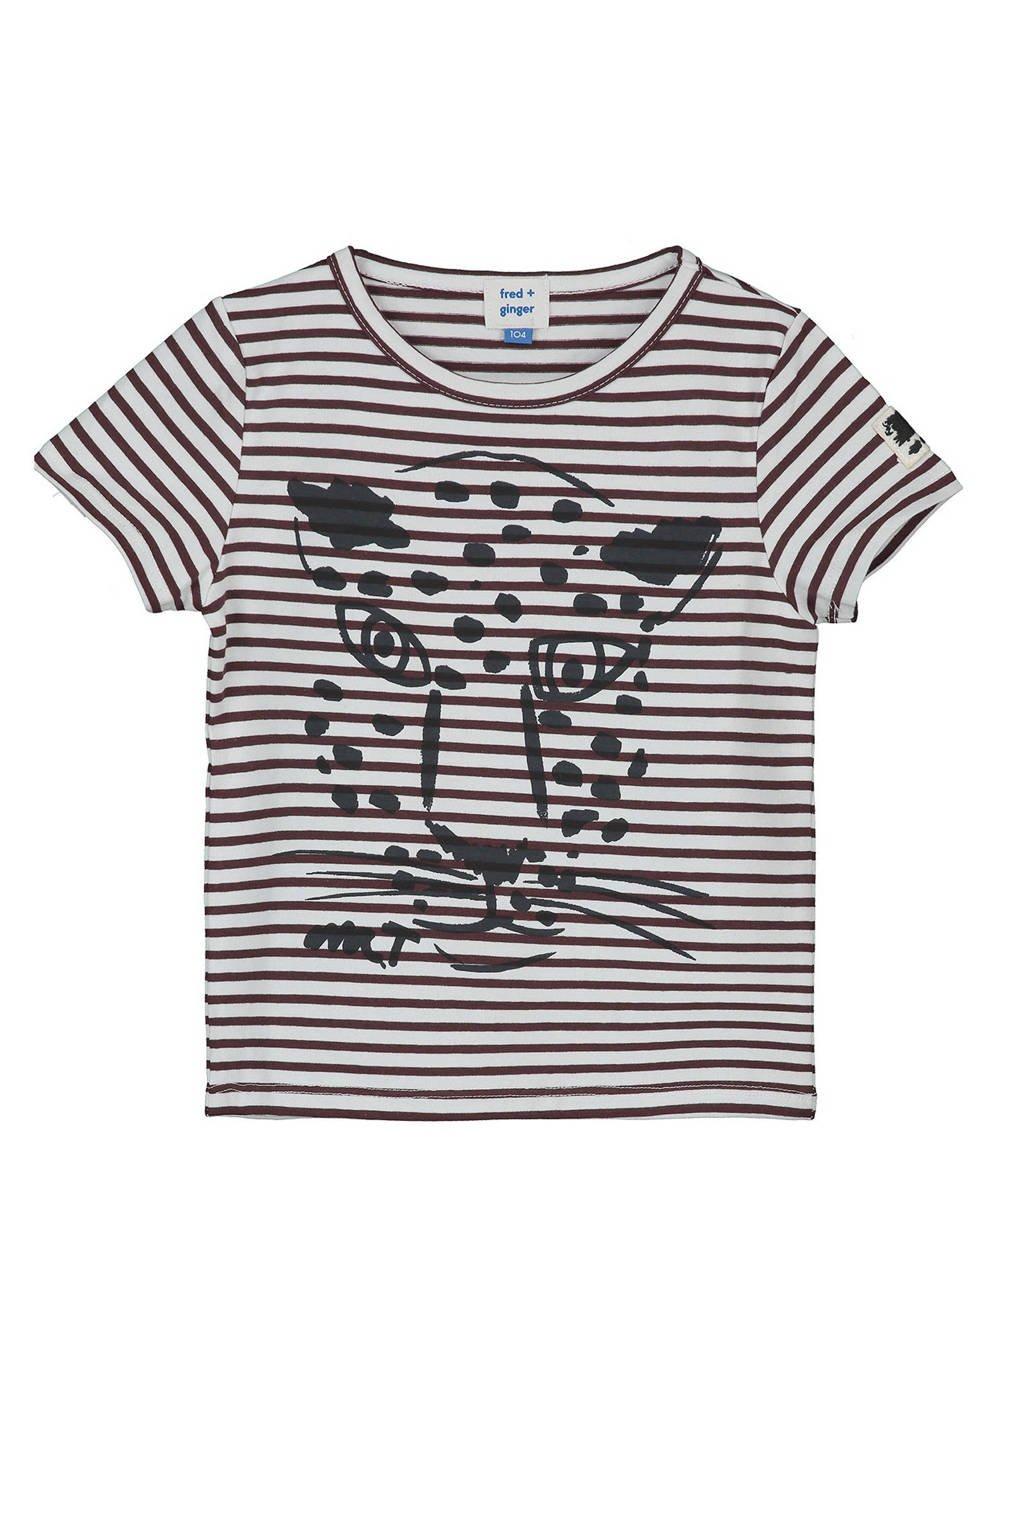 fred + ginger gestreept T-shirt met printopdruk rood, Donkerrood/wit